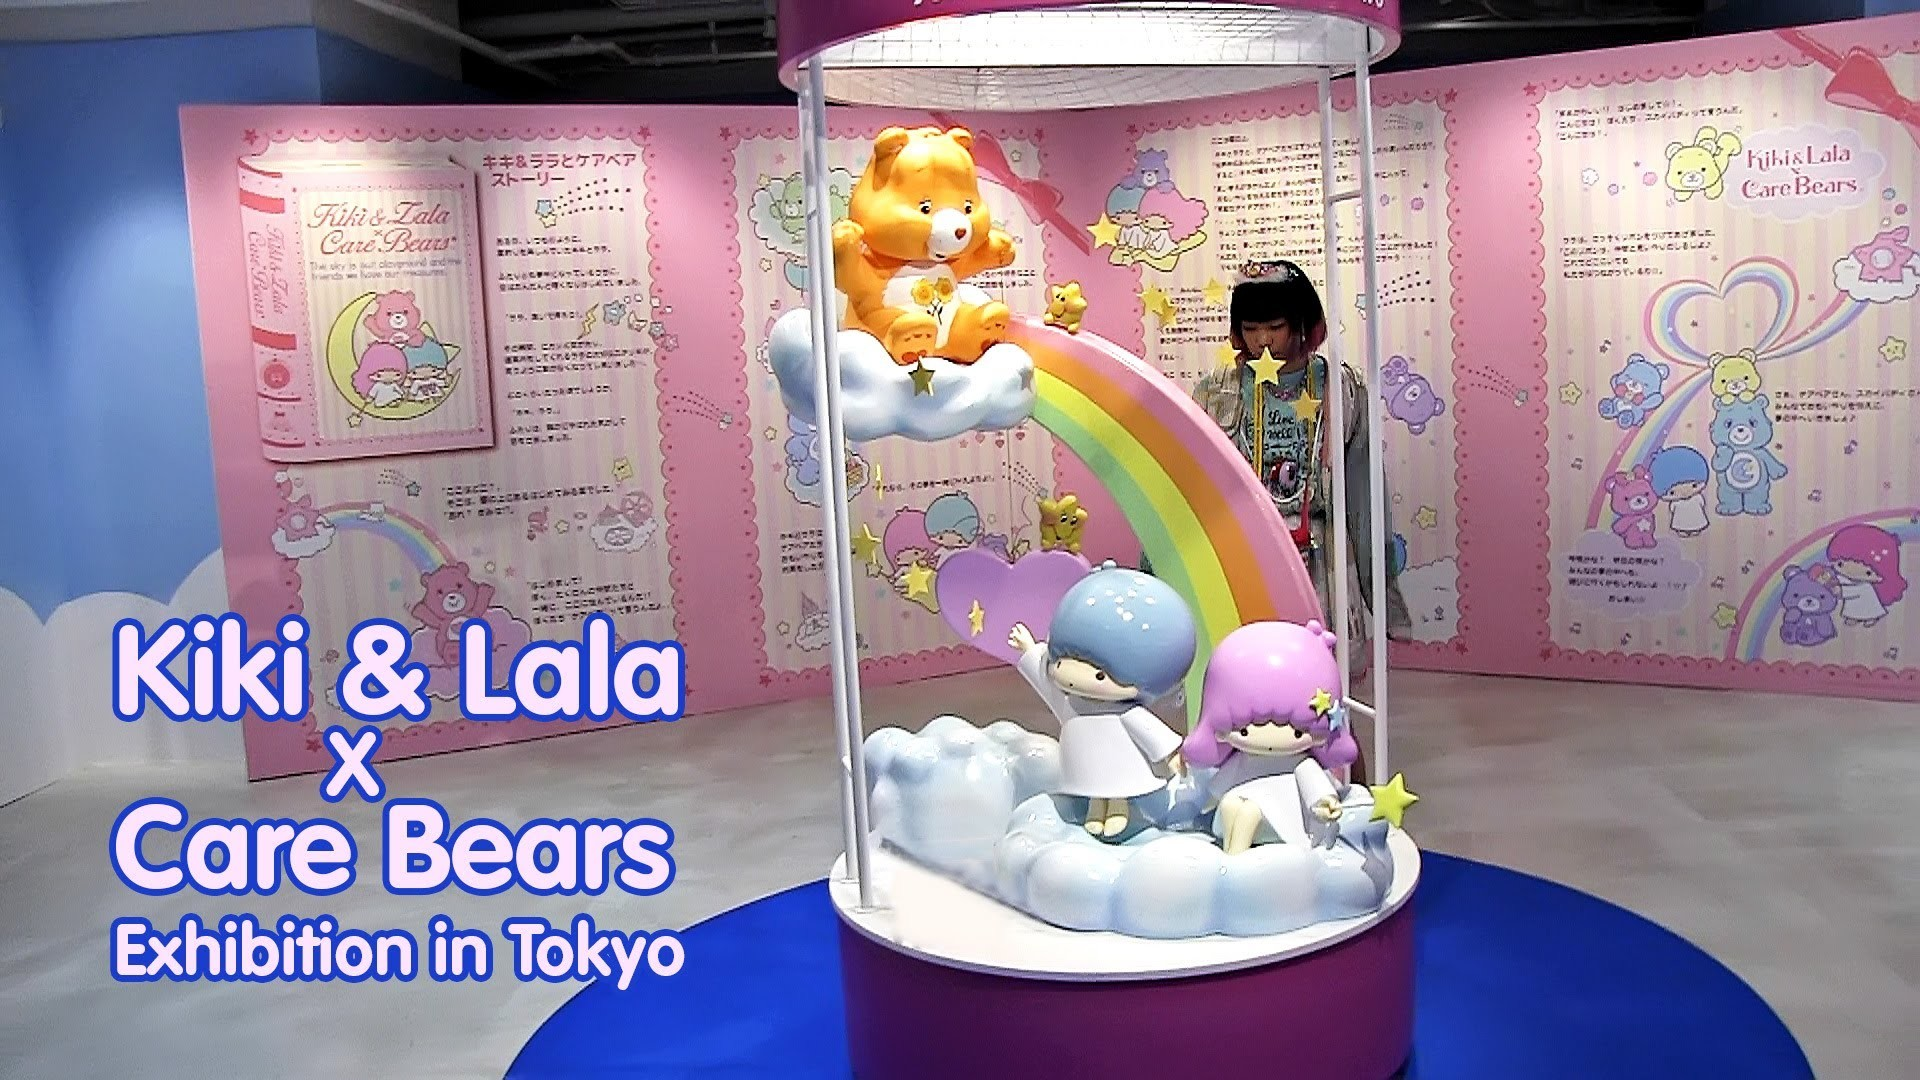 Kiki & Lala x Care Bears Exhibition Tokyo – キキ&ララ × ケアベア 展 – YouTube